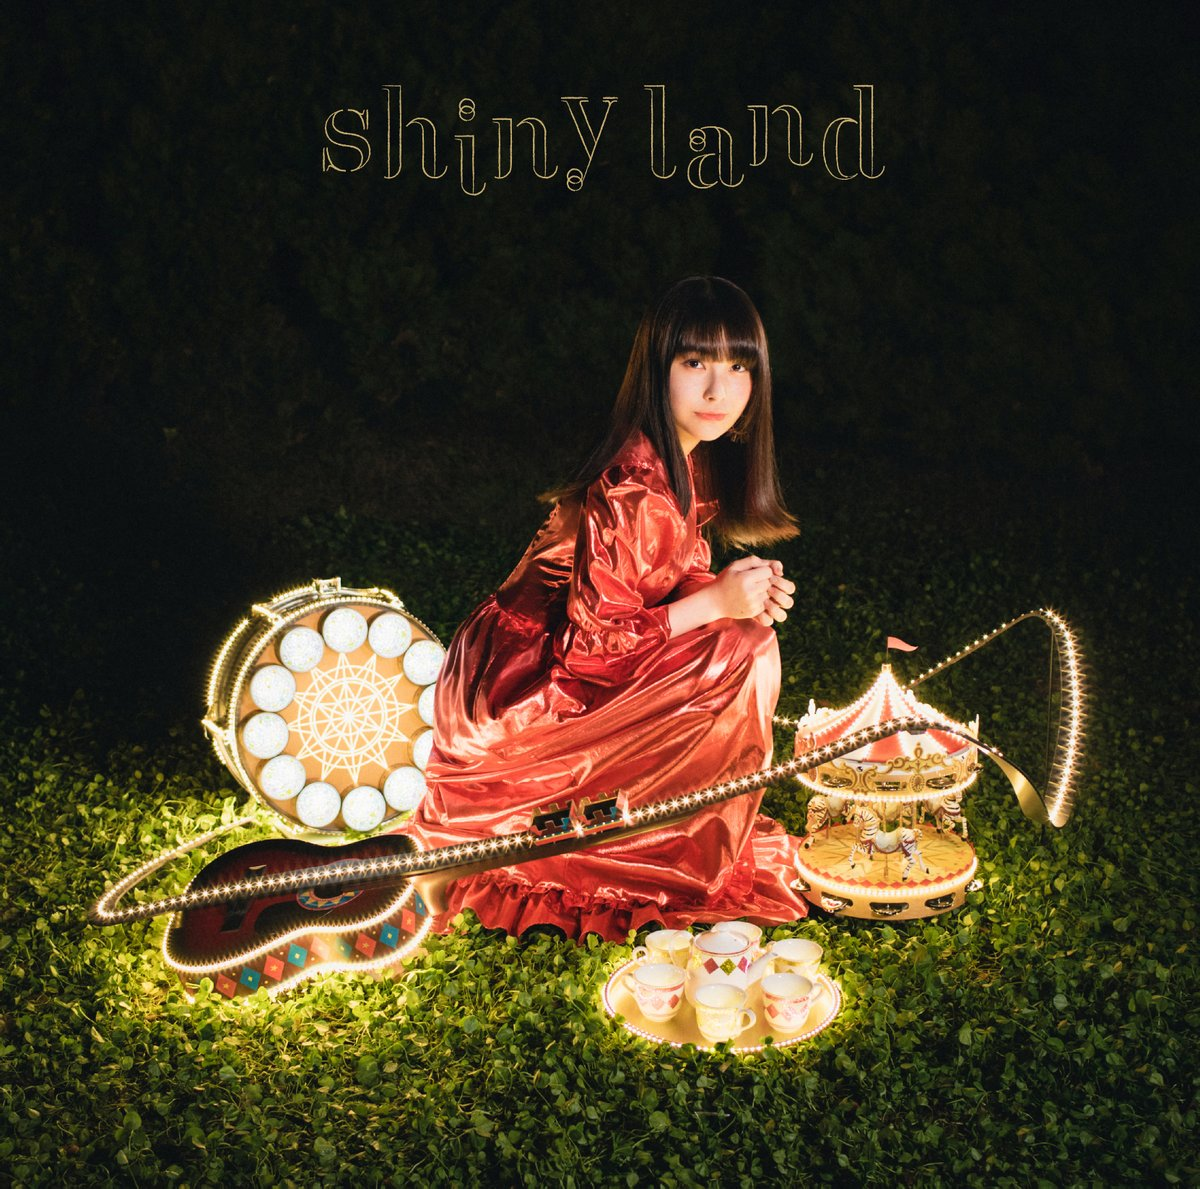 坂口有望 Ami Sakaguchi - shiny land [2020.02.19+MP3+RAR]